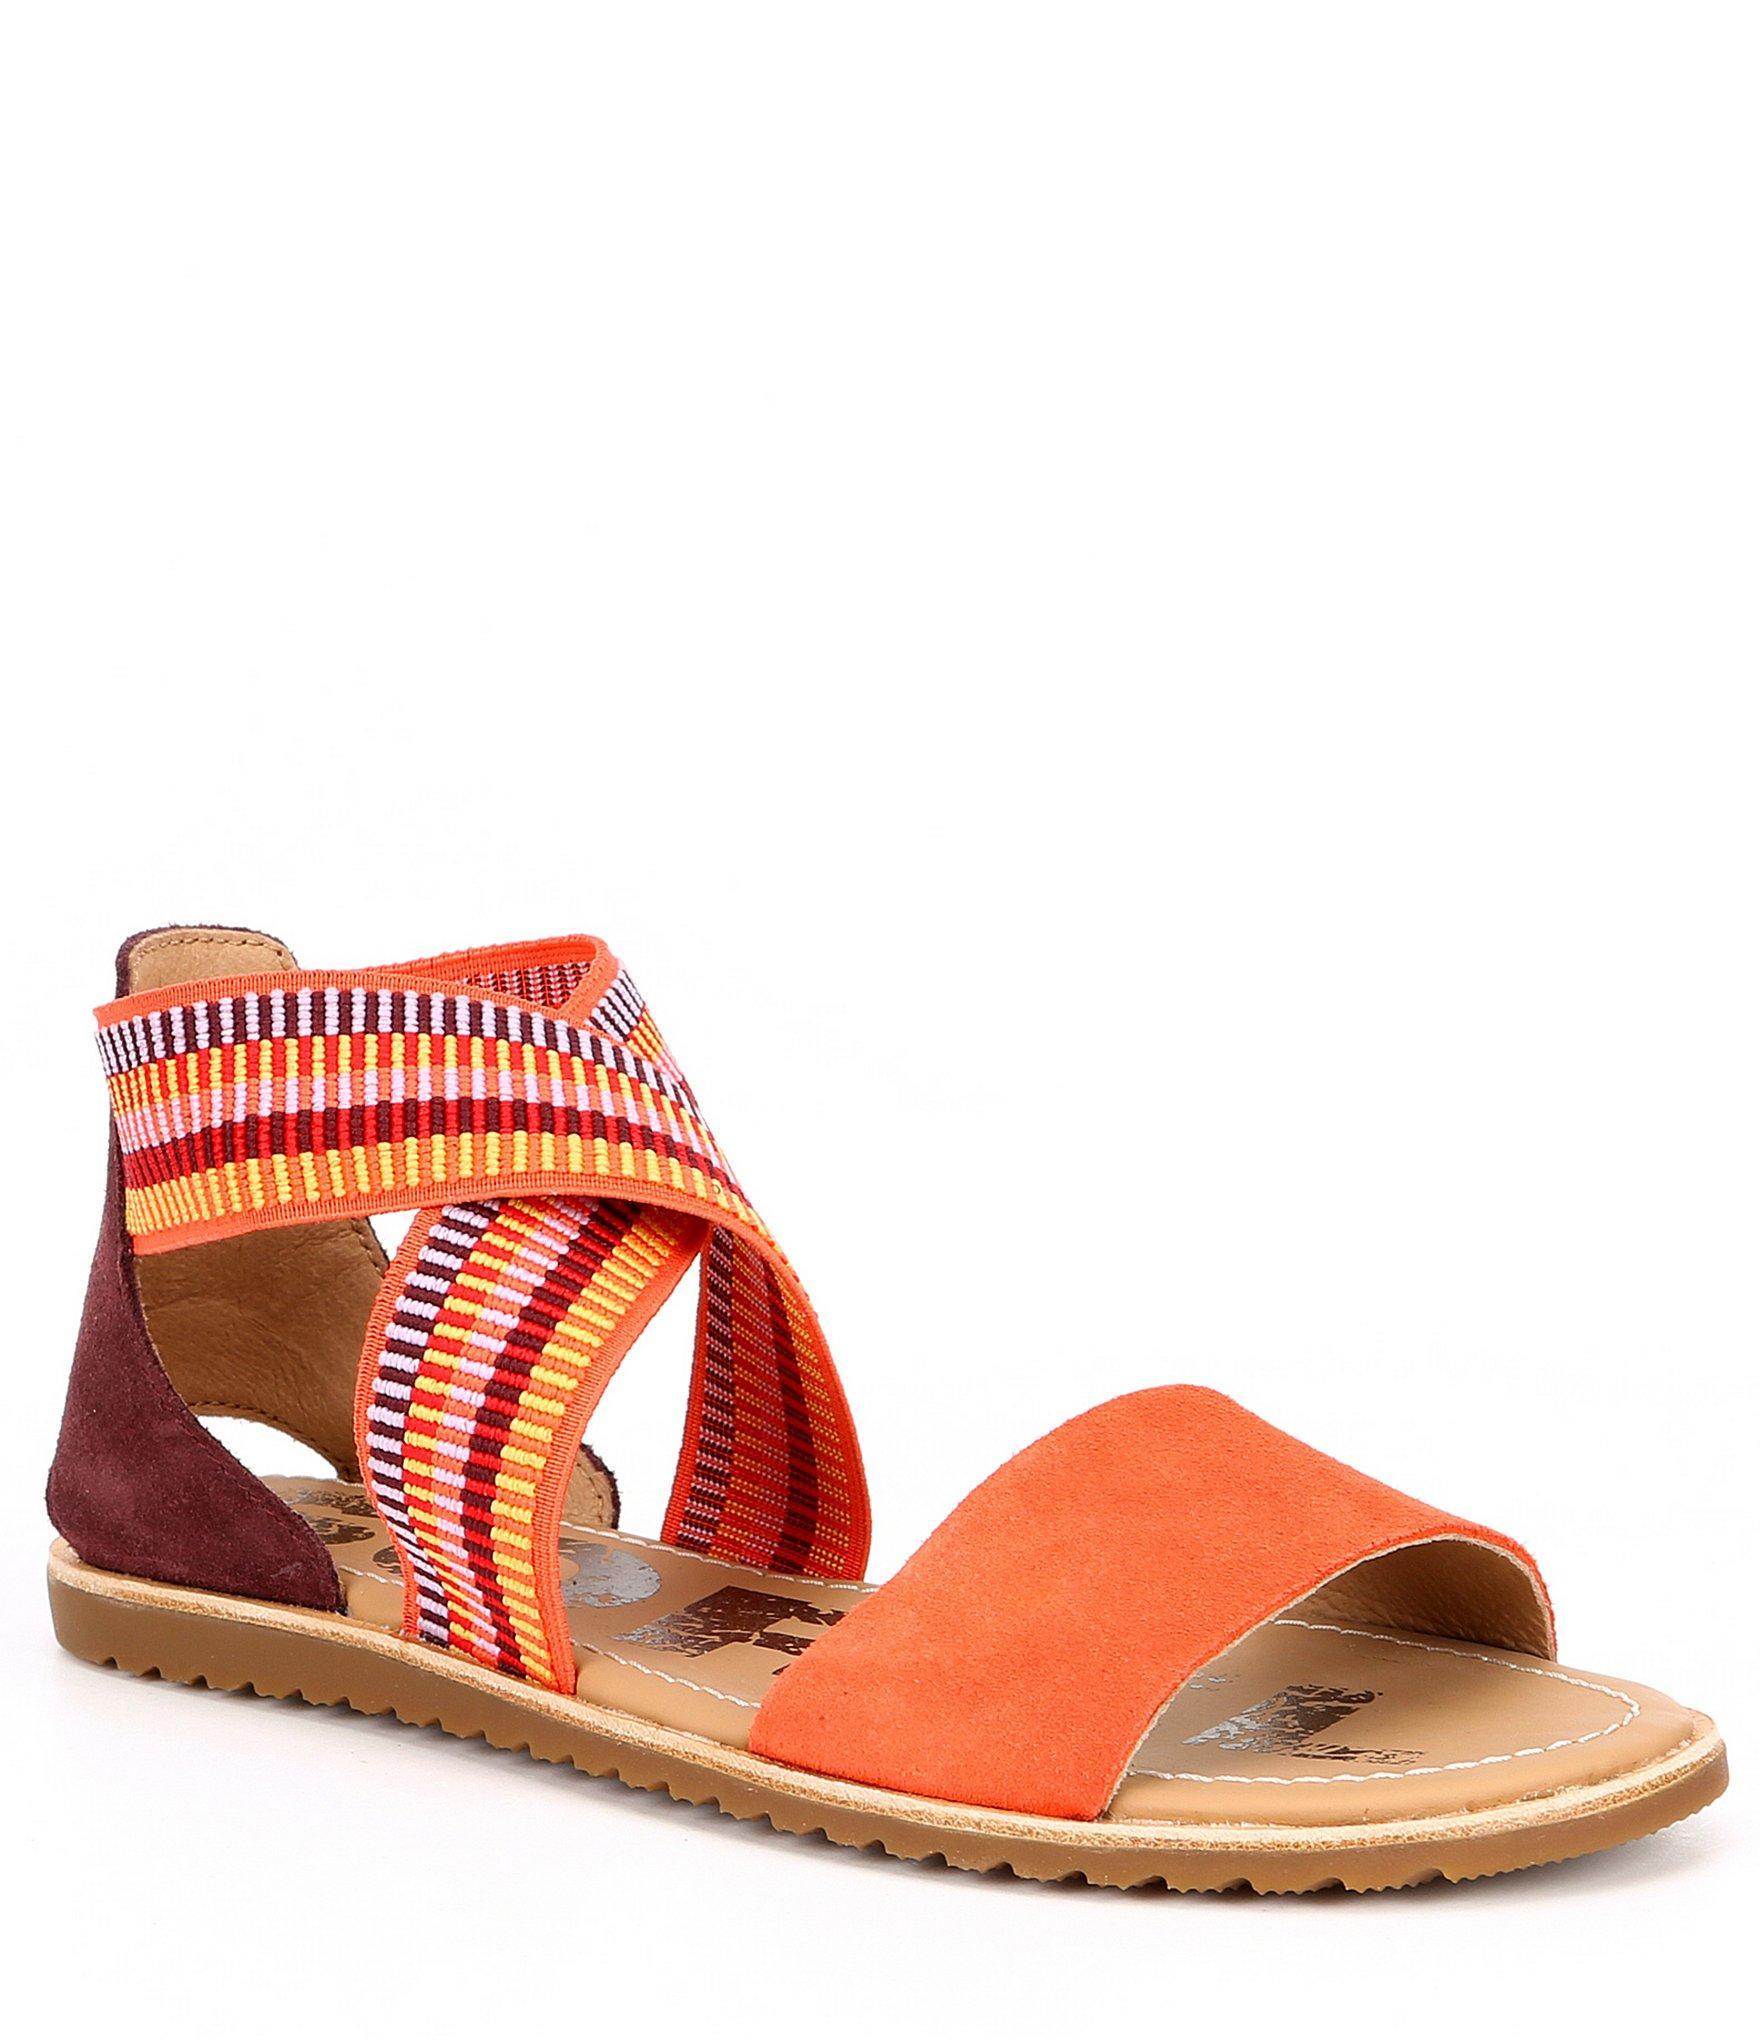 37b2f1806 Lyst - Sorel Ella Leather Platform Sandal in Red